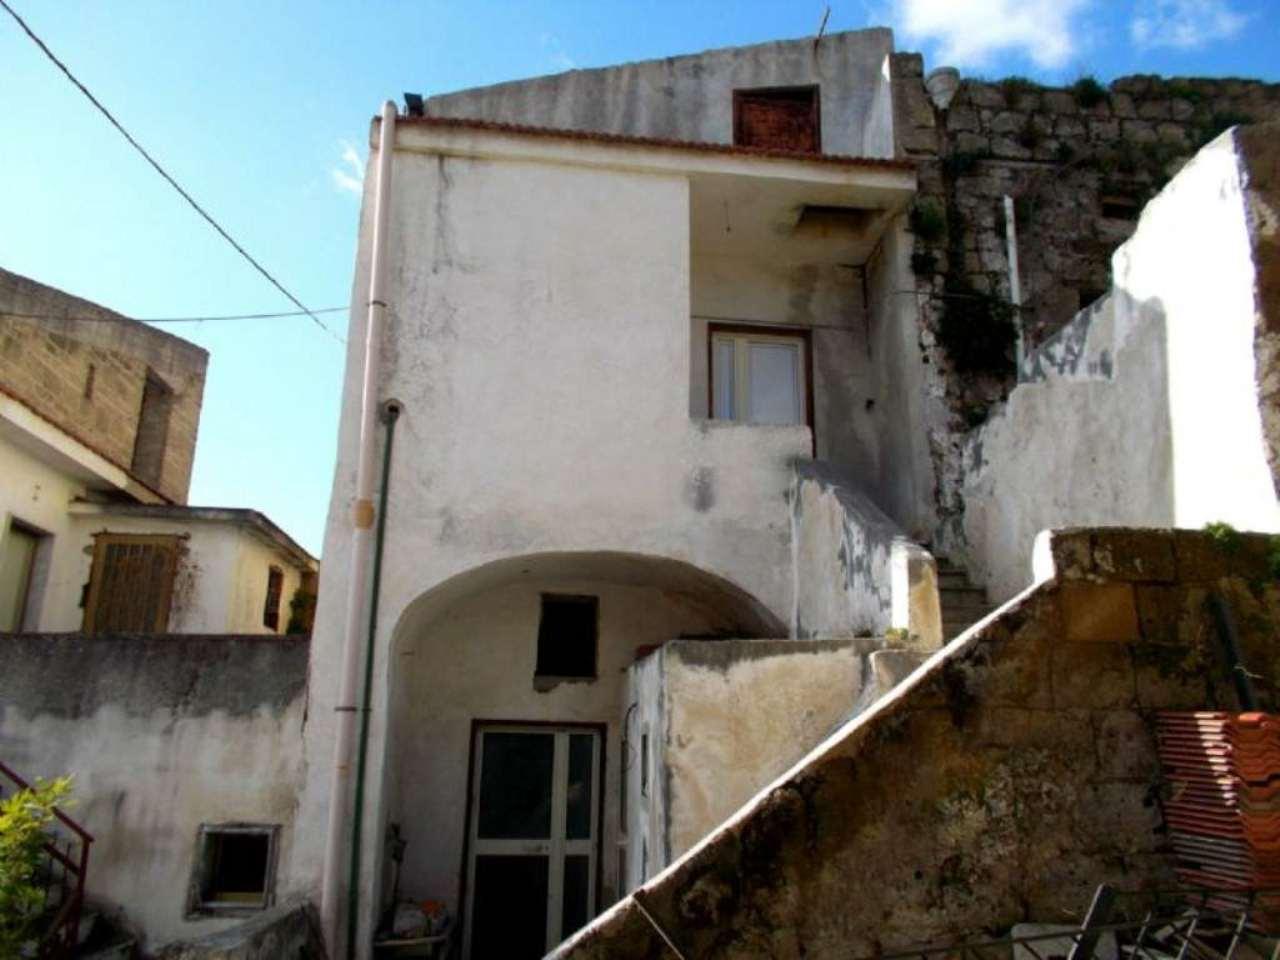 Bilocale Santa Maria a Vico Via Appia Antica 2